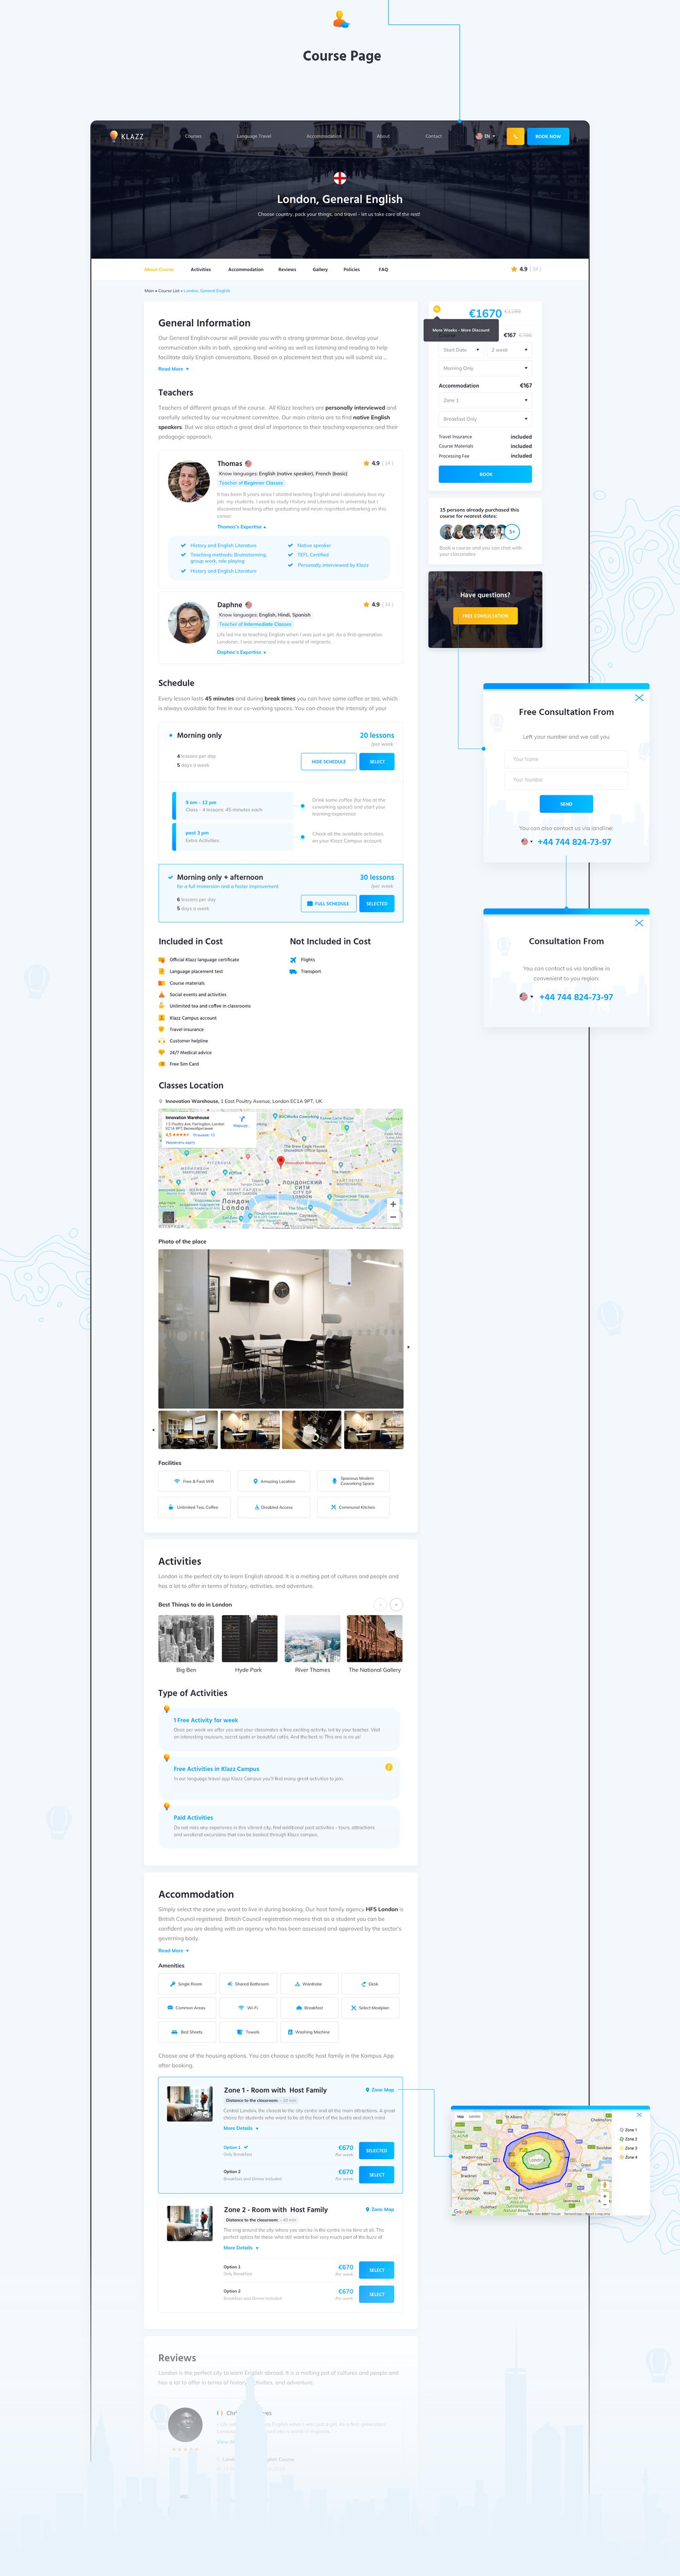 Web design UI ux Platform Webdesign Interface mobile user experience Website